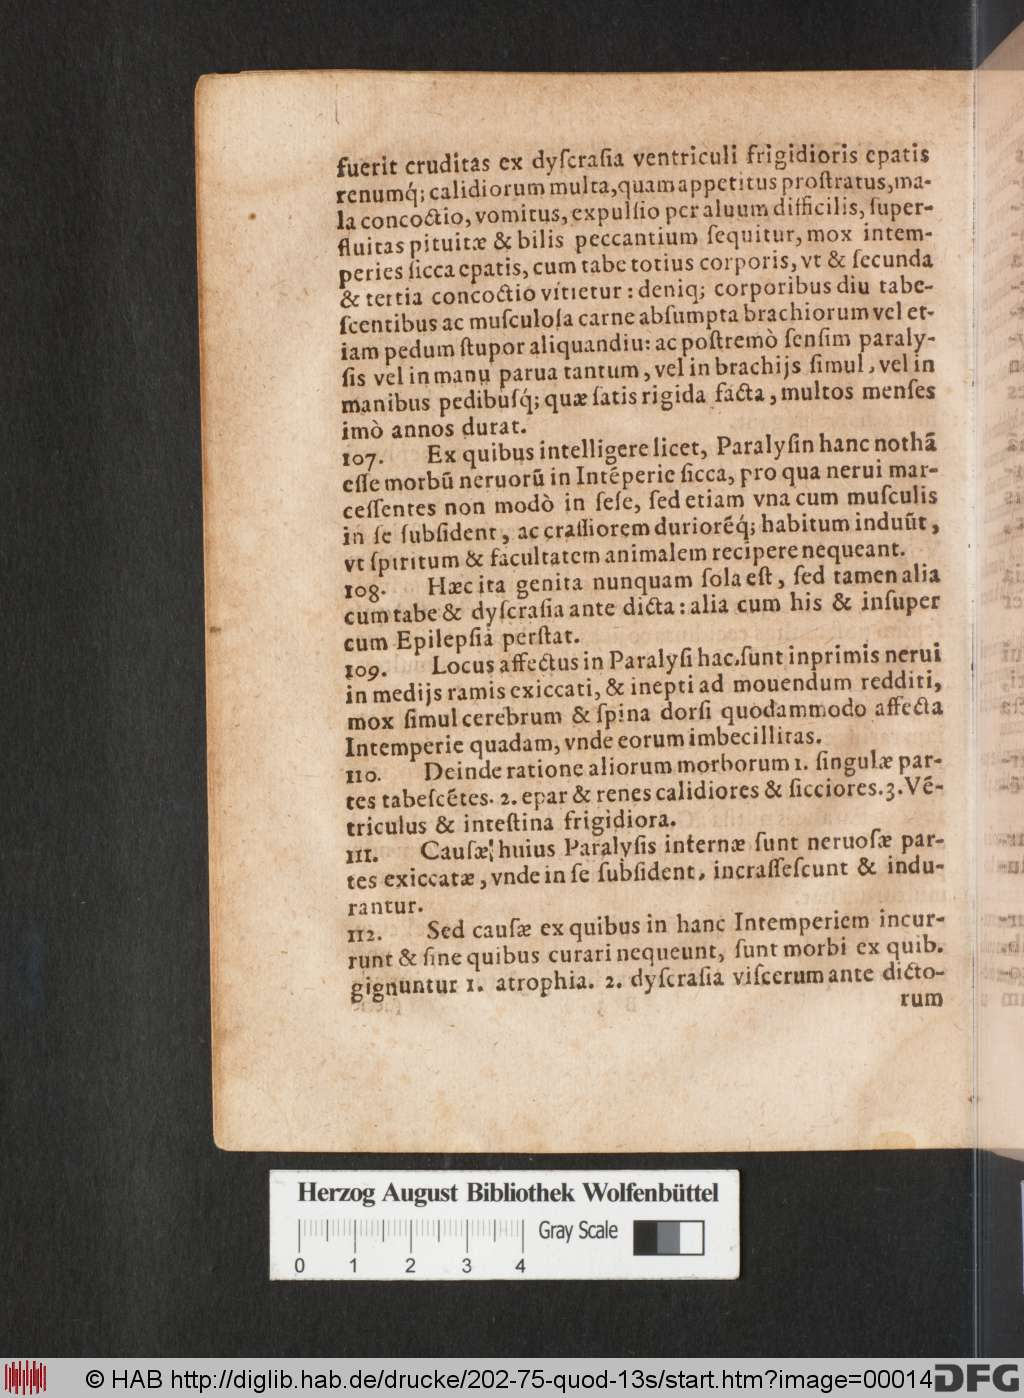 http://diglib.hab.de/drucke/202-75-quod-13s/00014.jpg